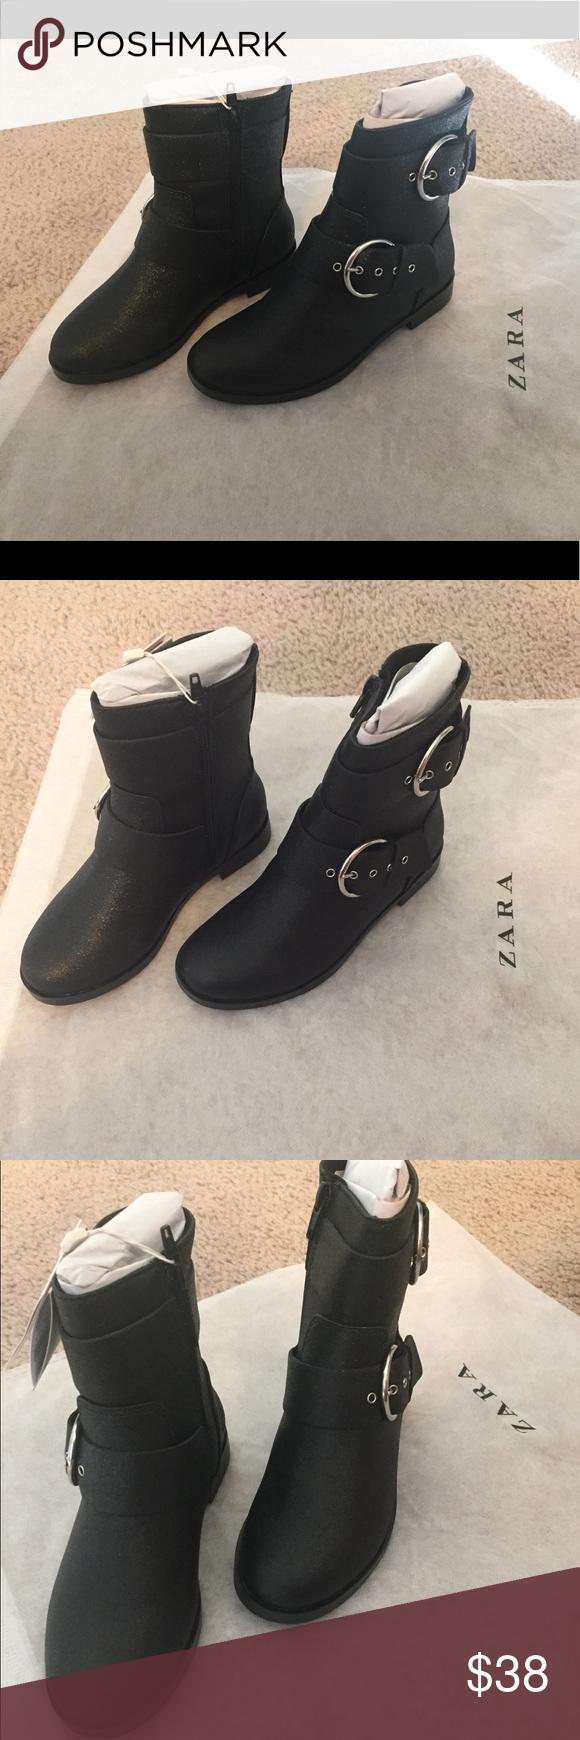 Zara boots for toddler girl nwt | Toddler girl boots, Zara ...